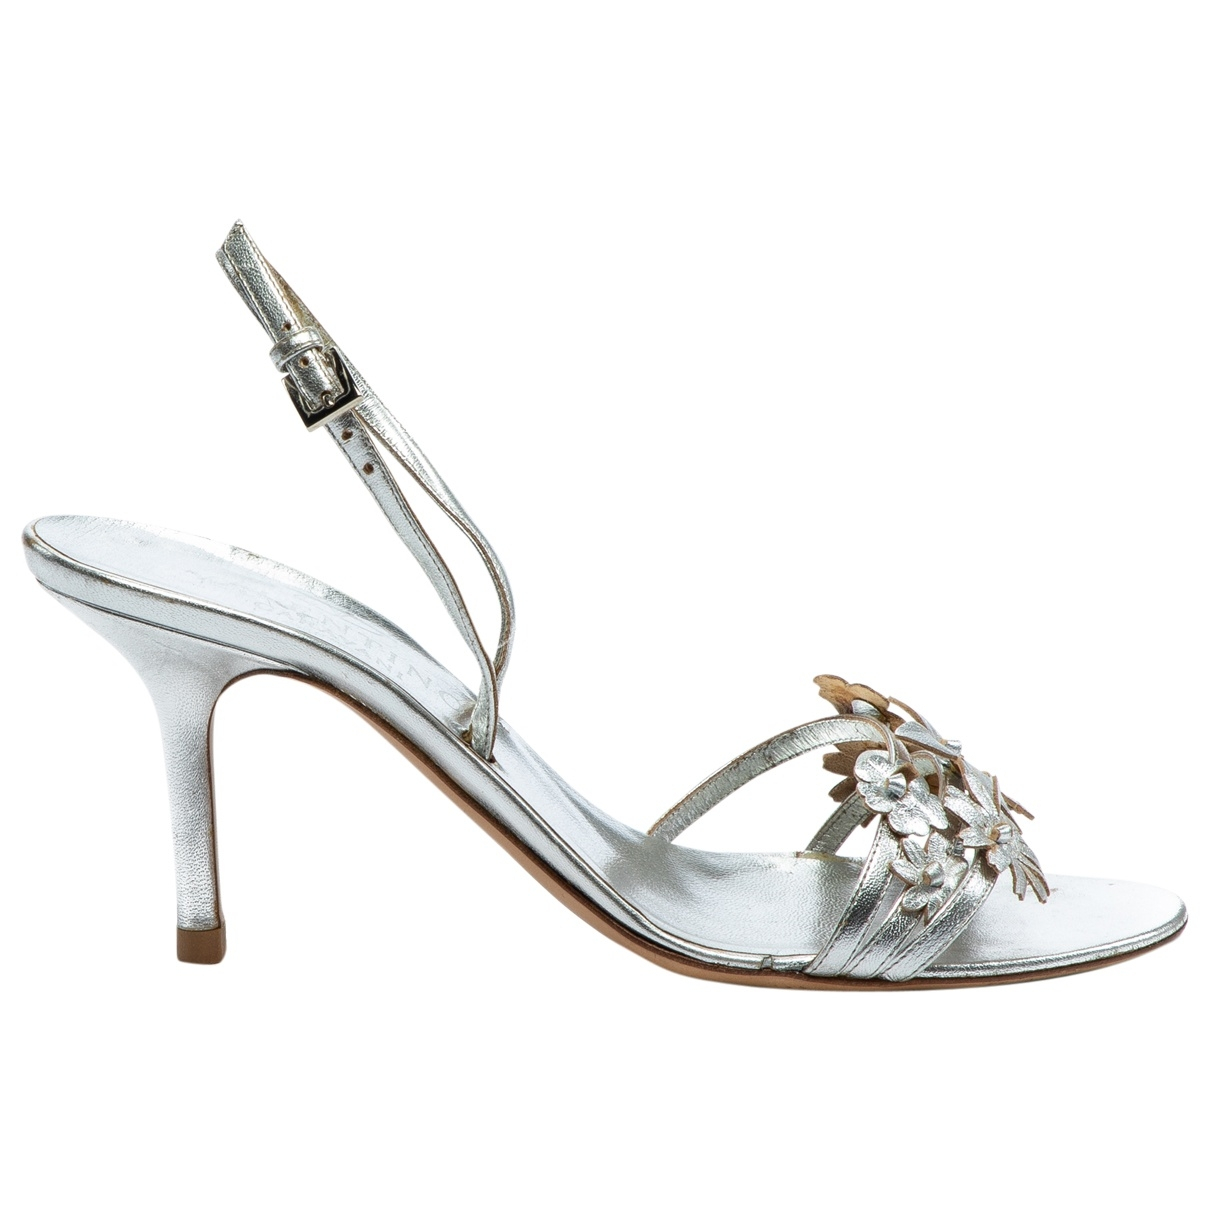 Valentino Garavani \N Silver Leather Sandals for Women 38.5 EU